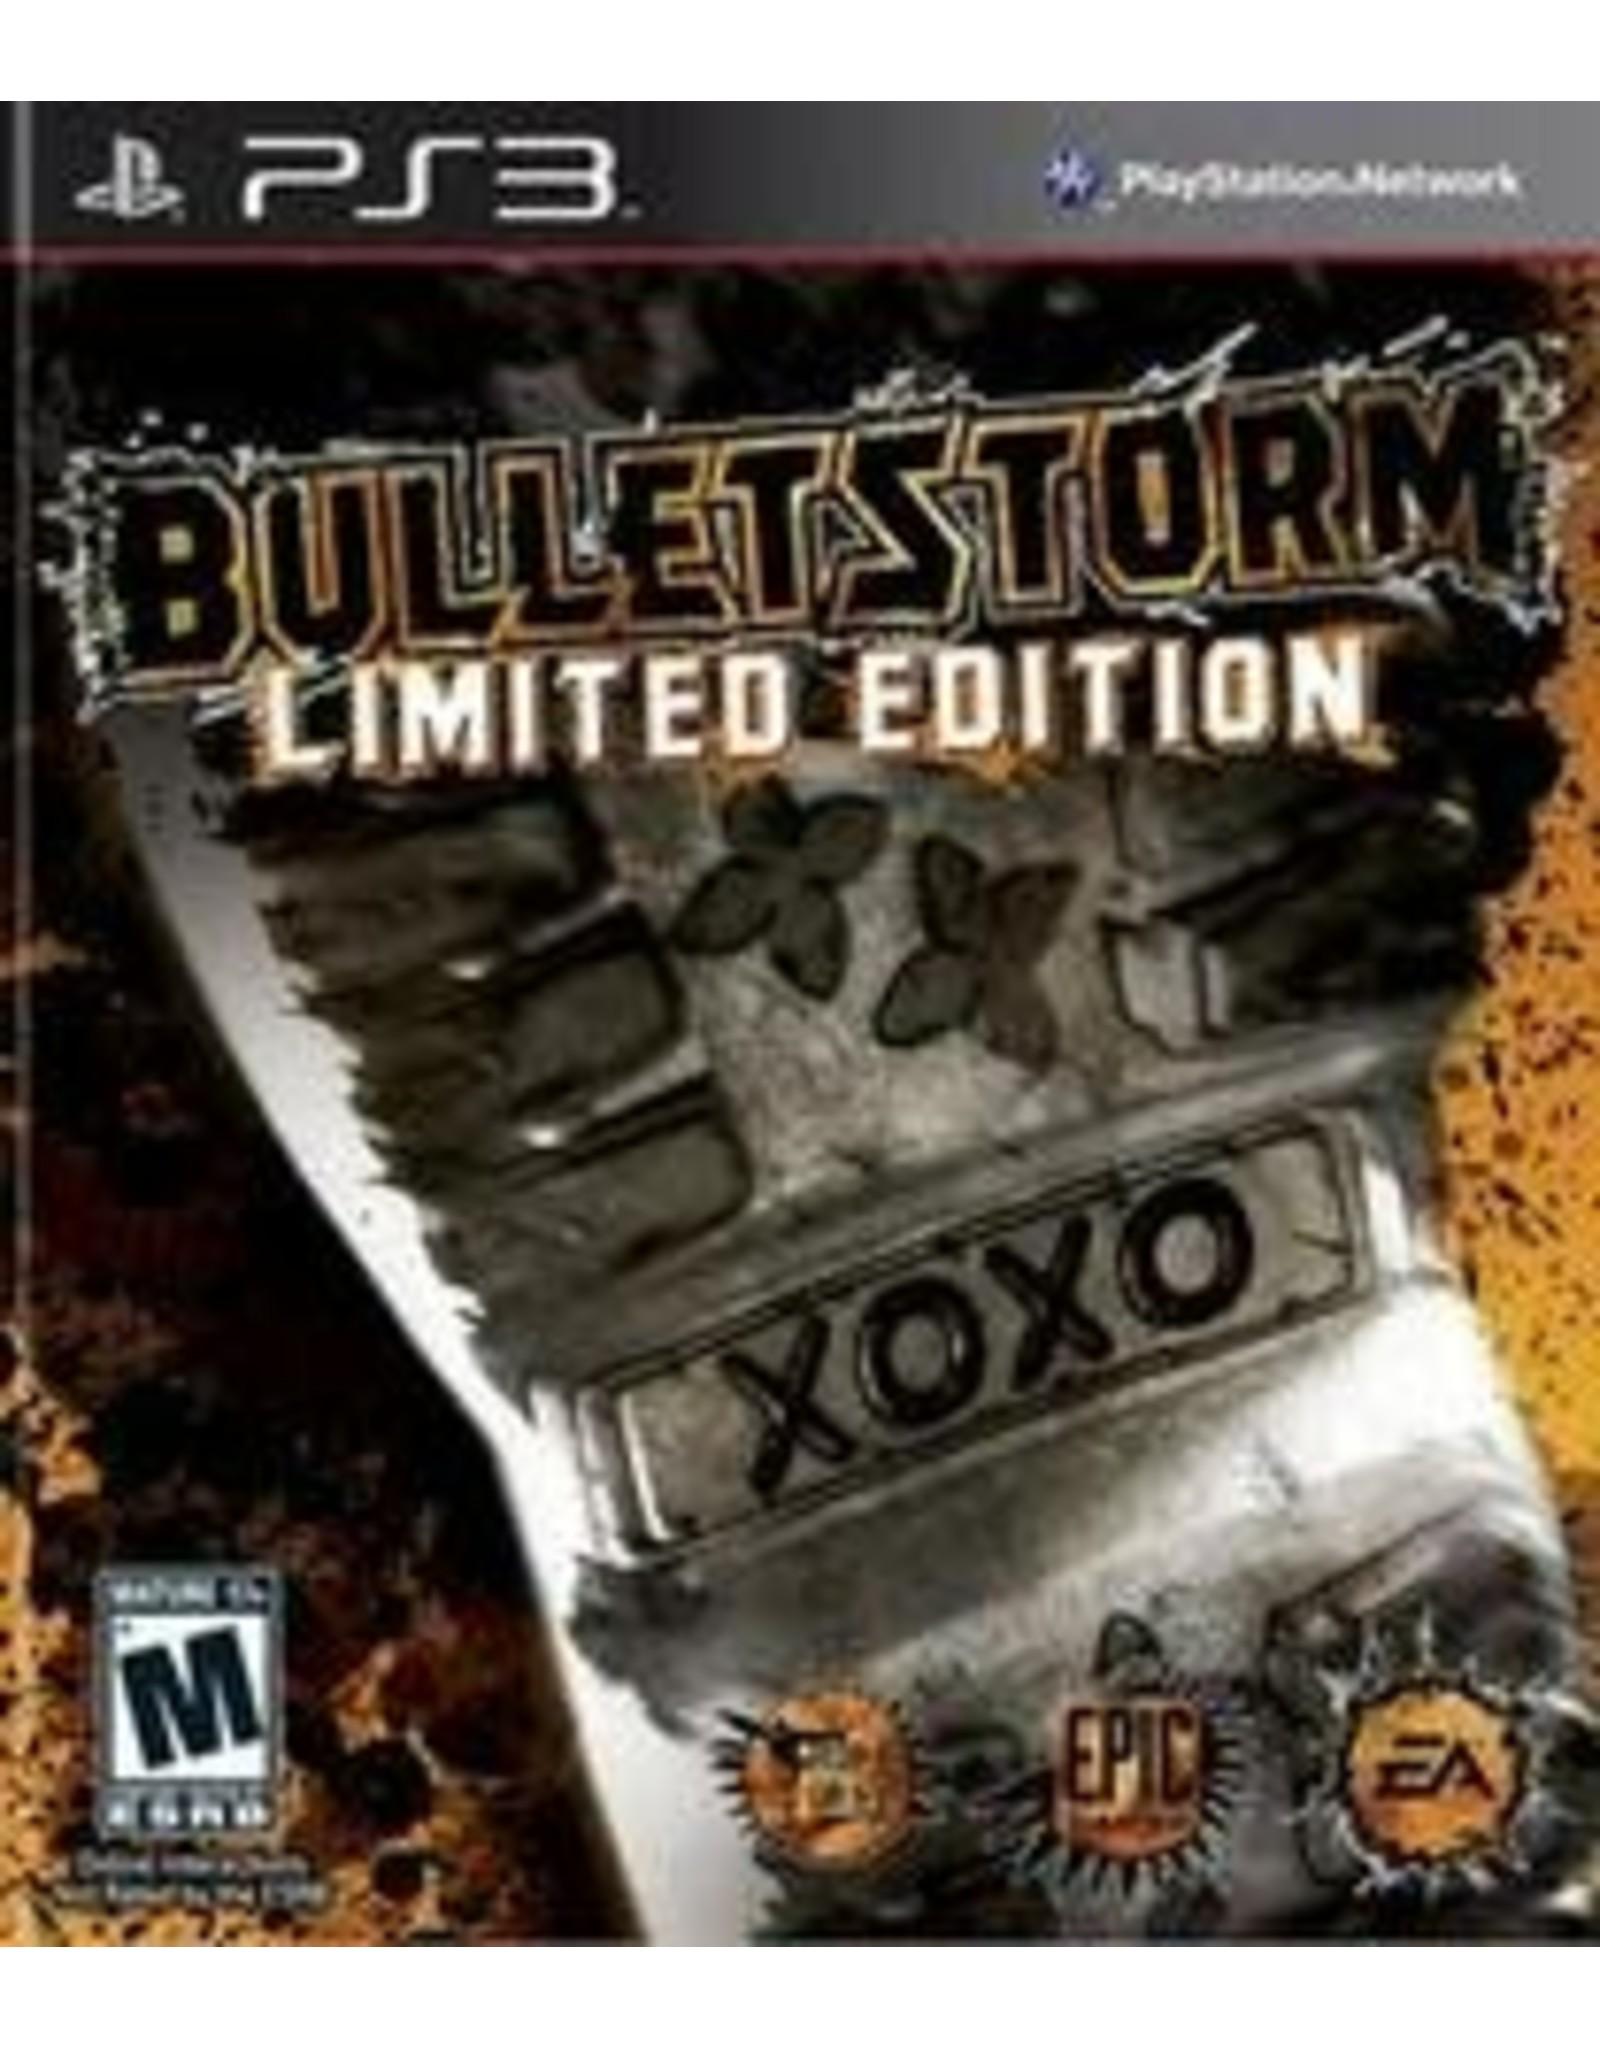 Playstation 3 Bulletstorm Limited Edition (CIB)